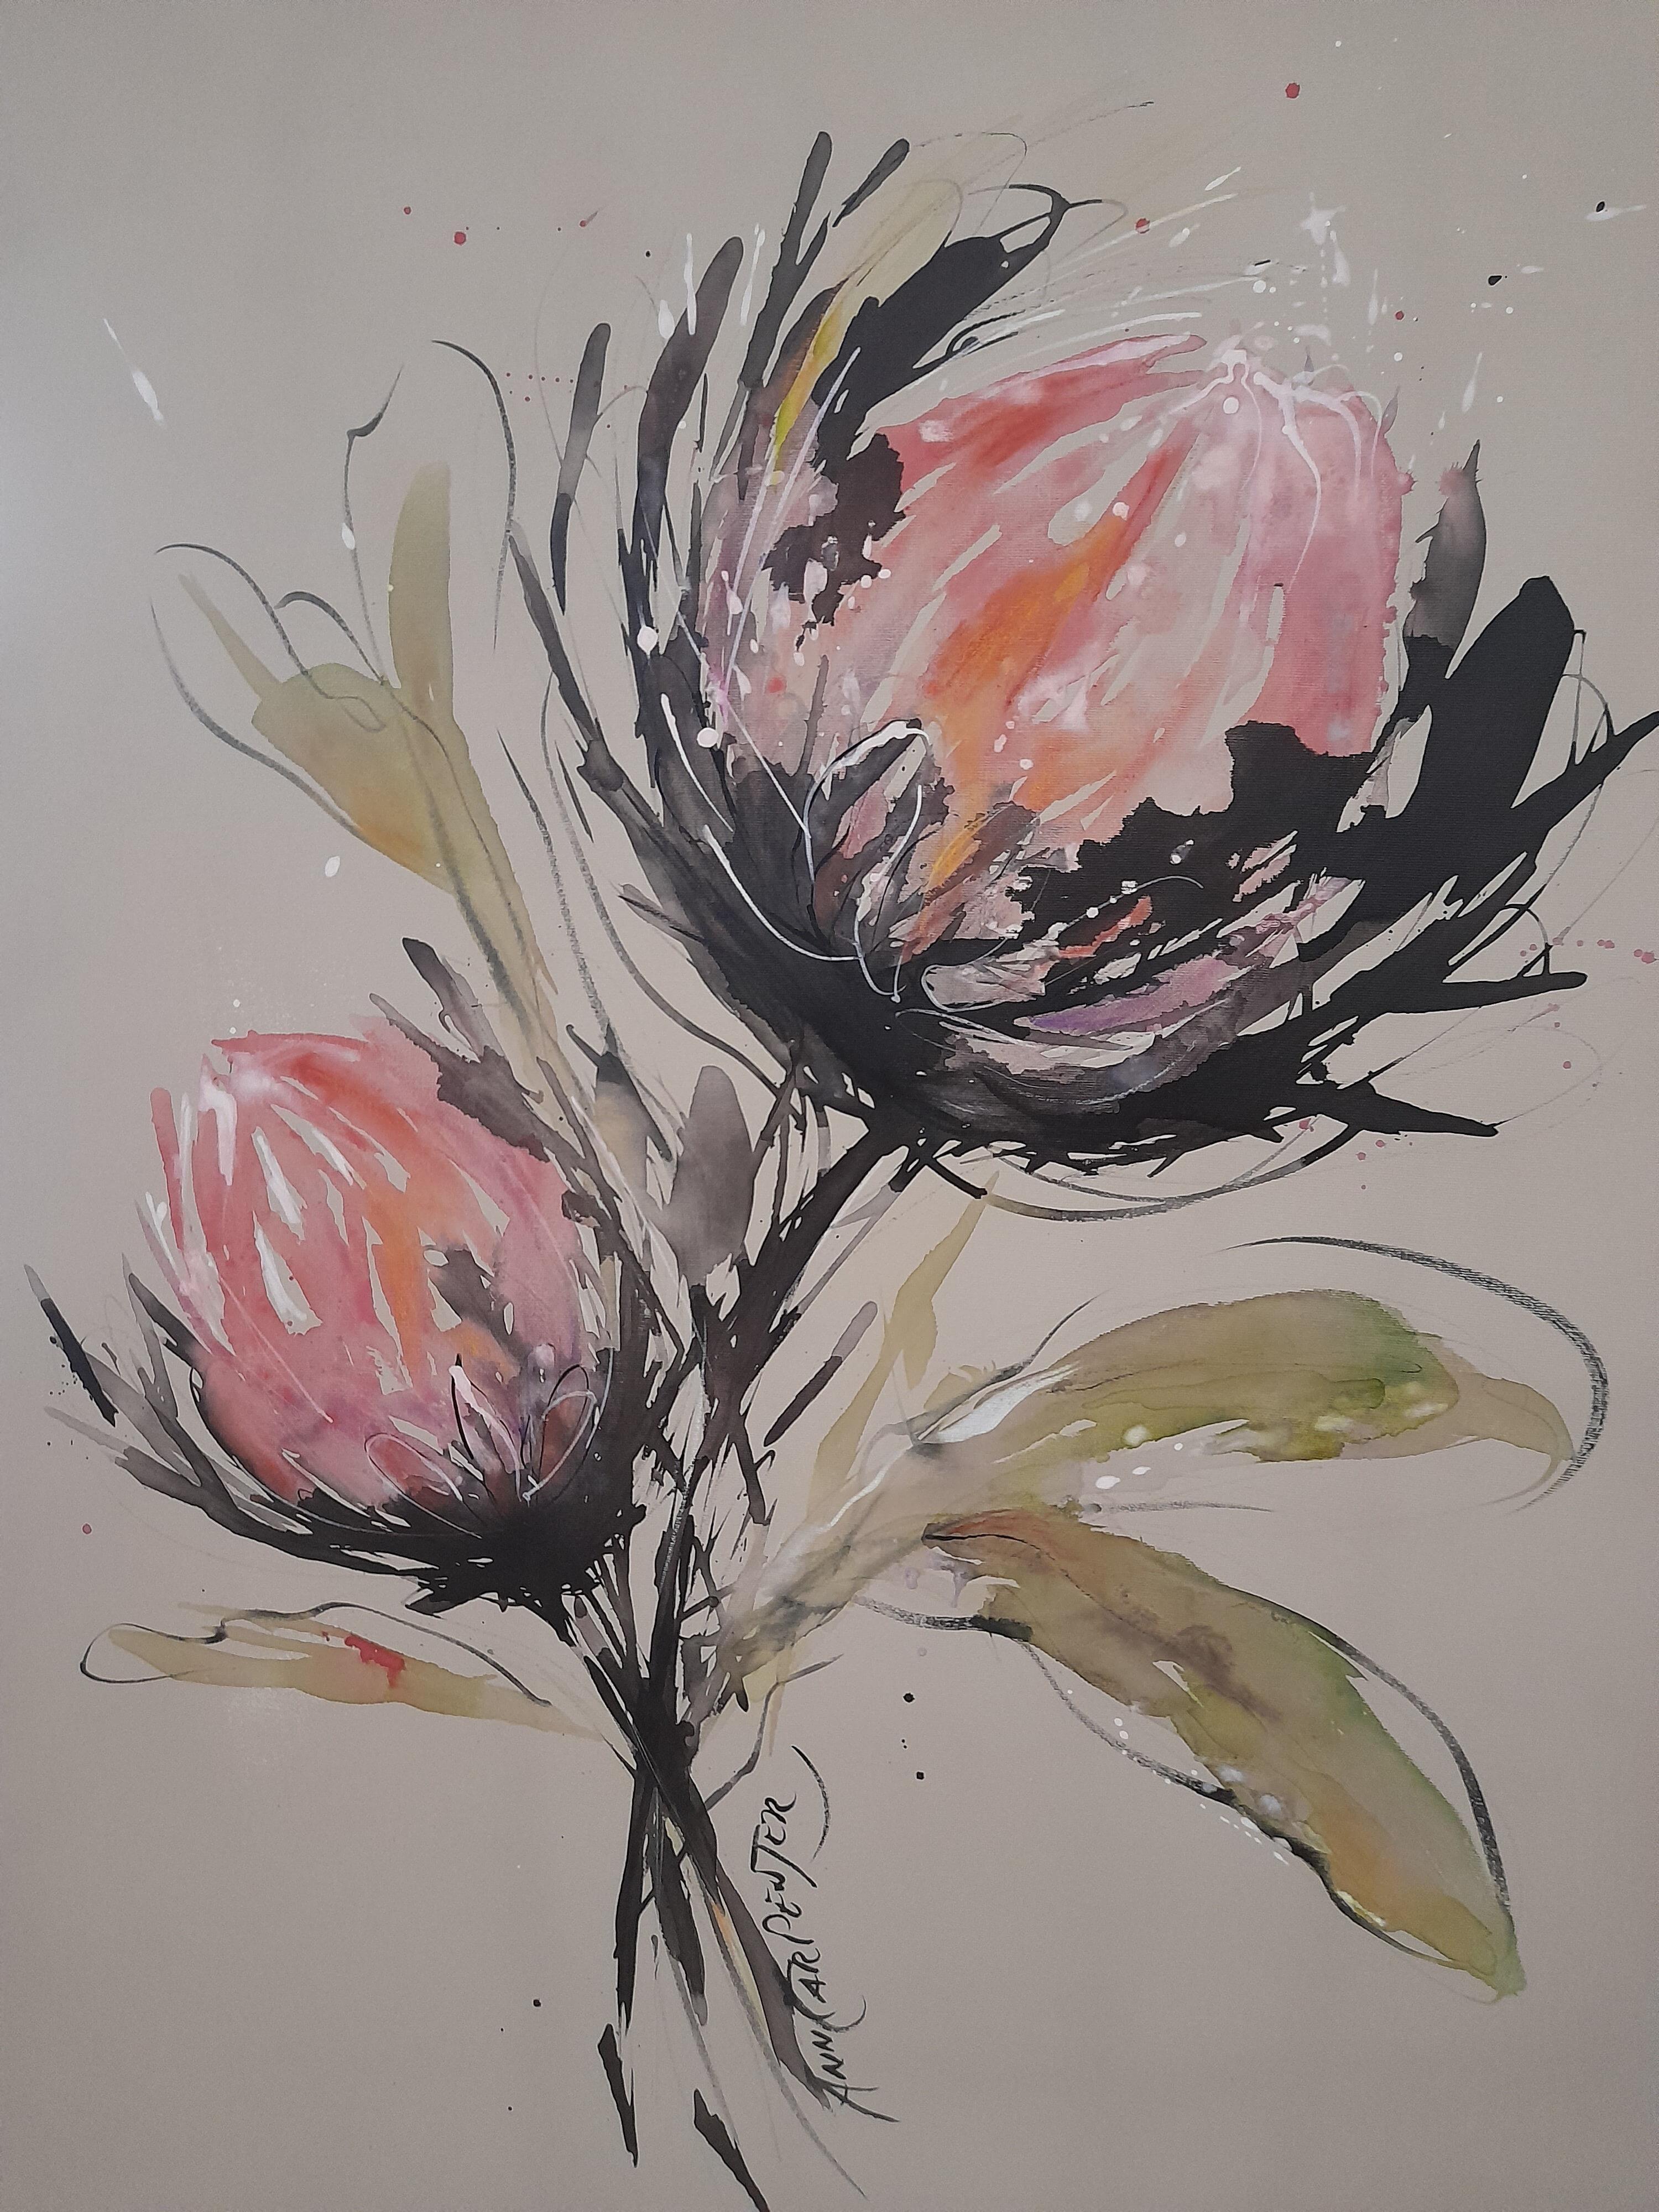 AnnCarpenter-JustPicked-ink-gouache-canvas-2021-91x61-unframed (1)